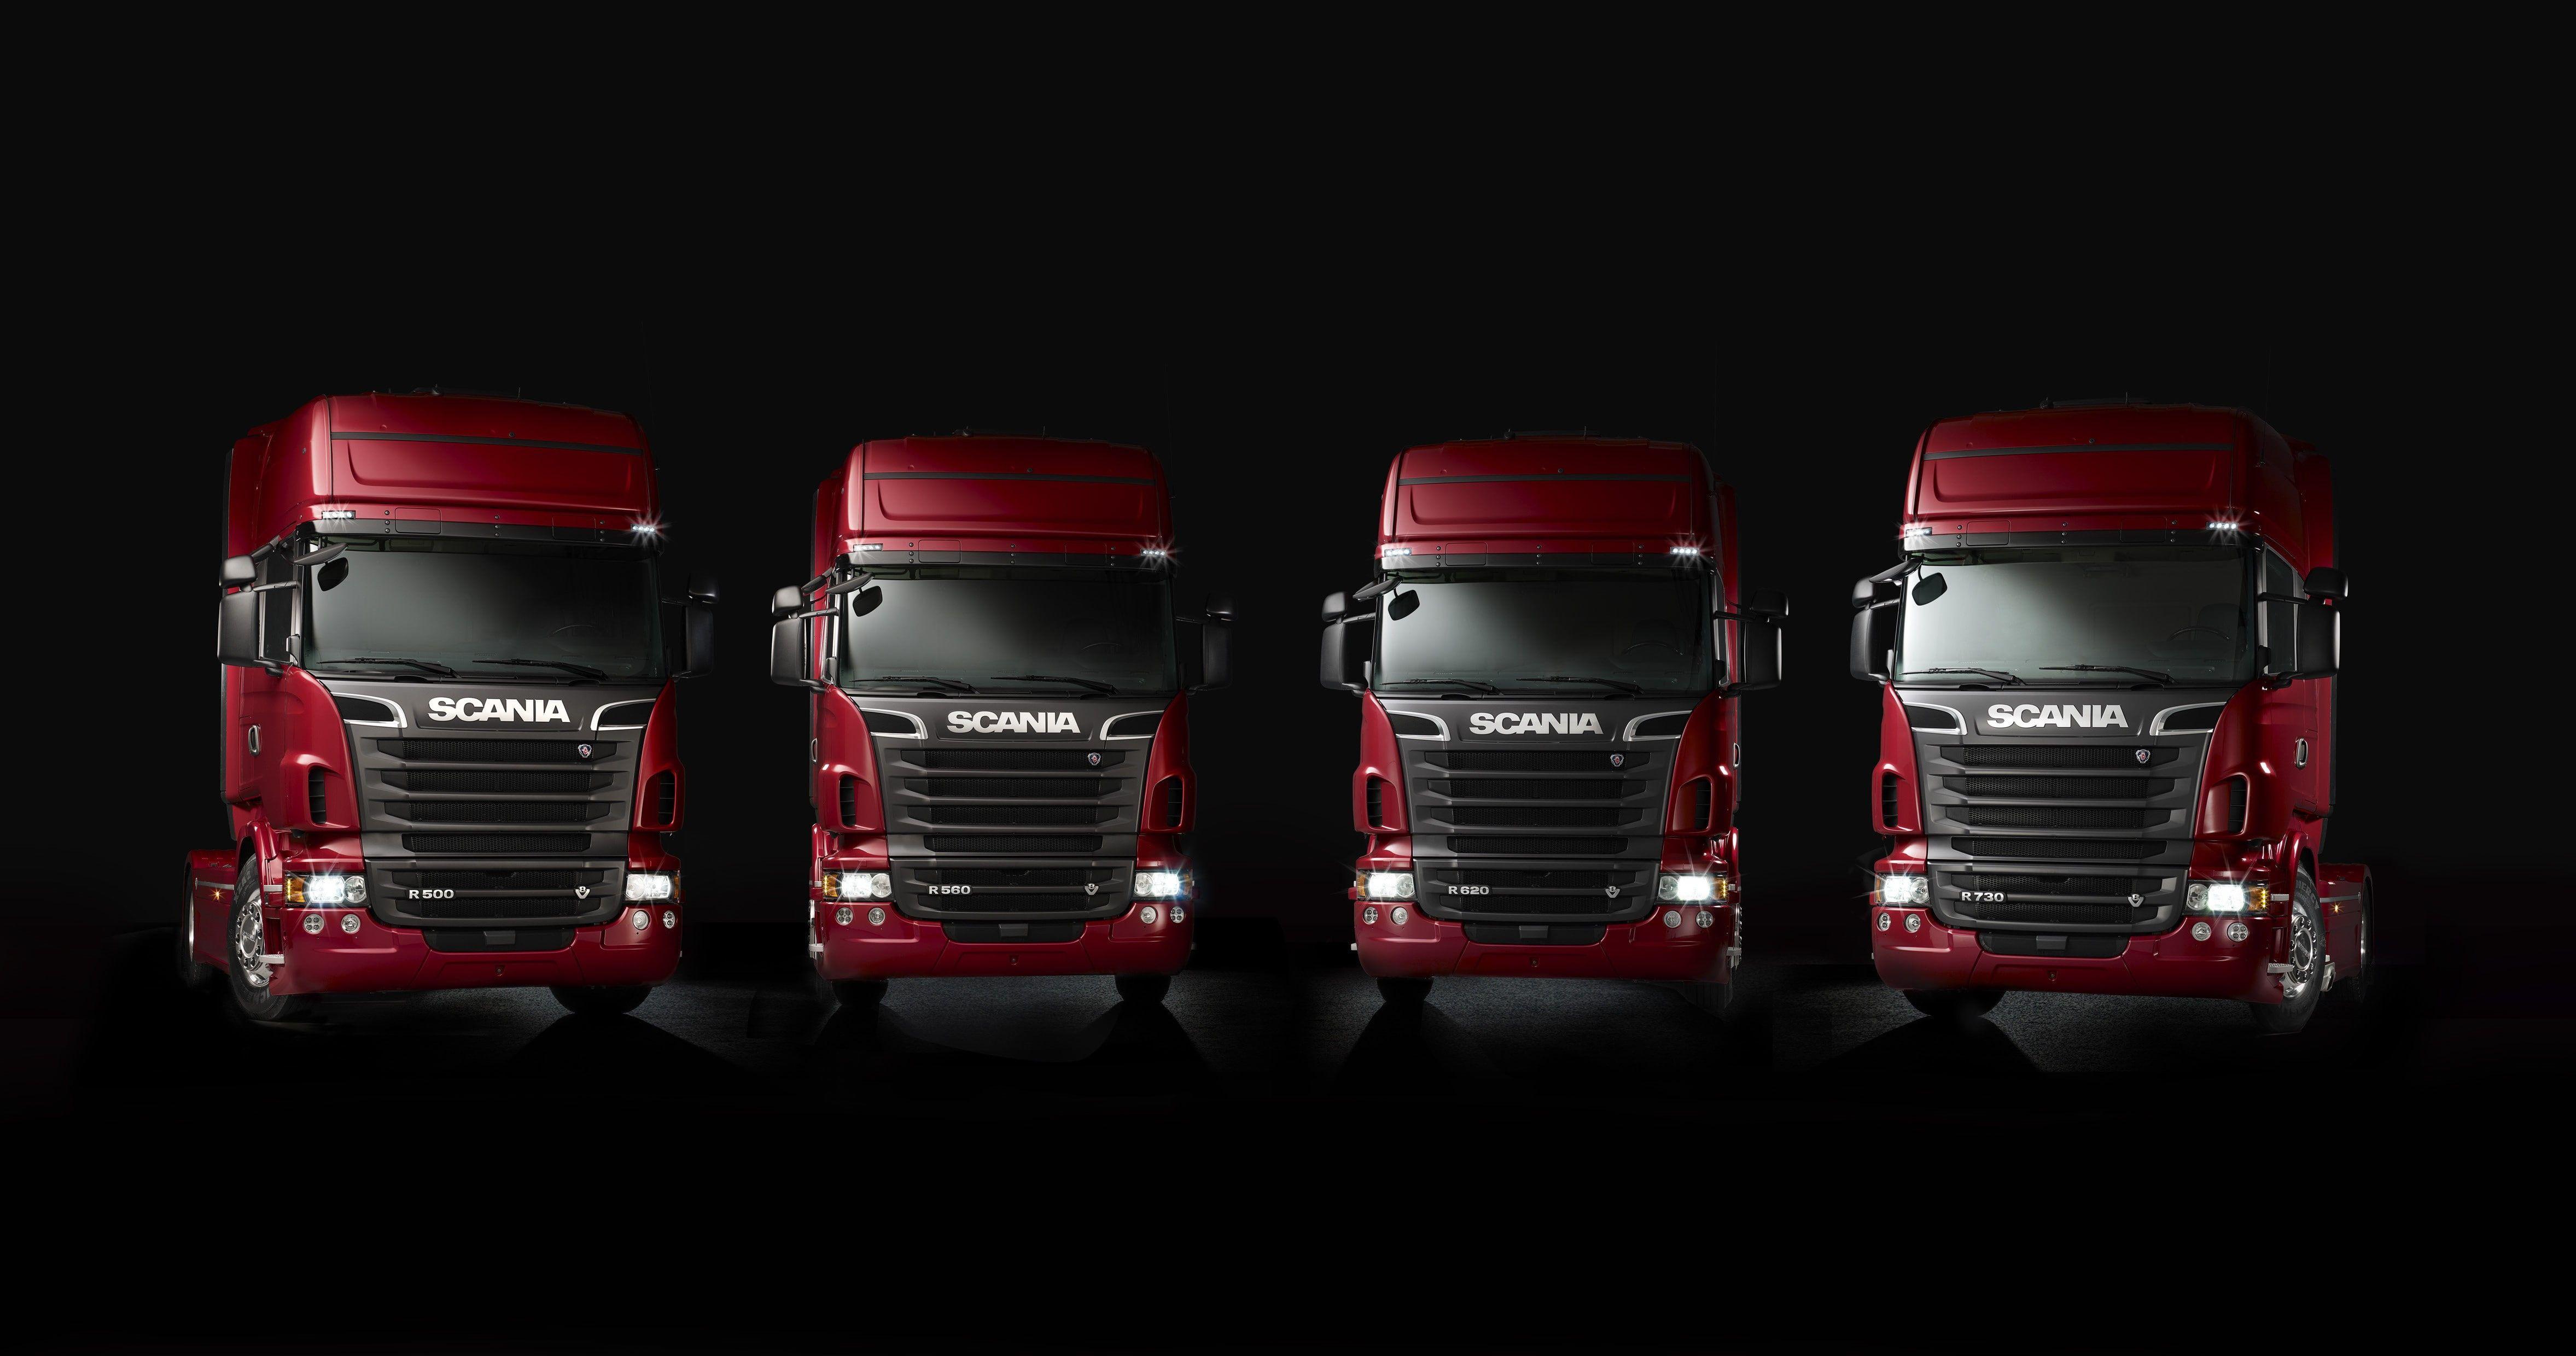 Scania Truck Vehicle 4k Wallpaper Hdwallpaper Desktop Trucks Wallpaper Hd Wallpaper